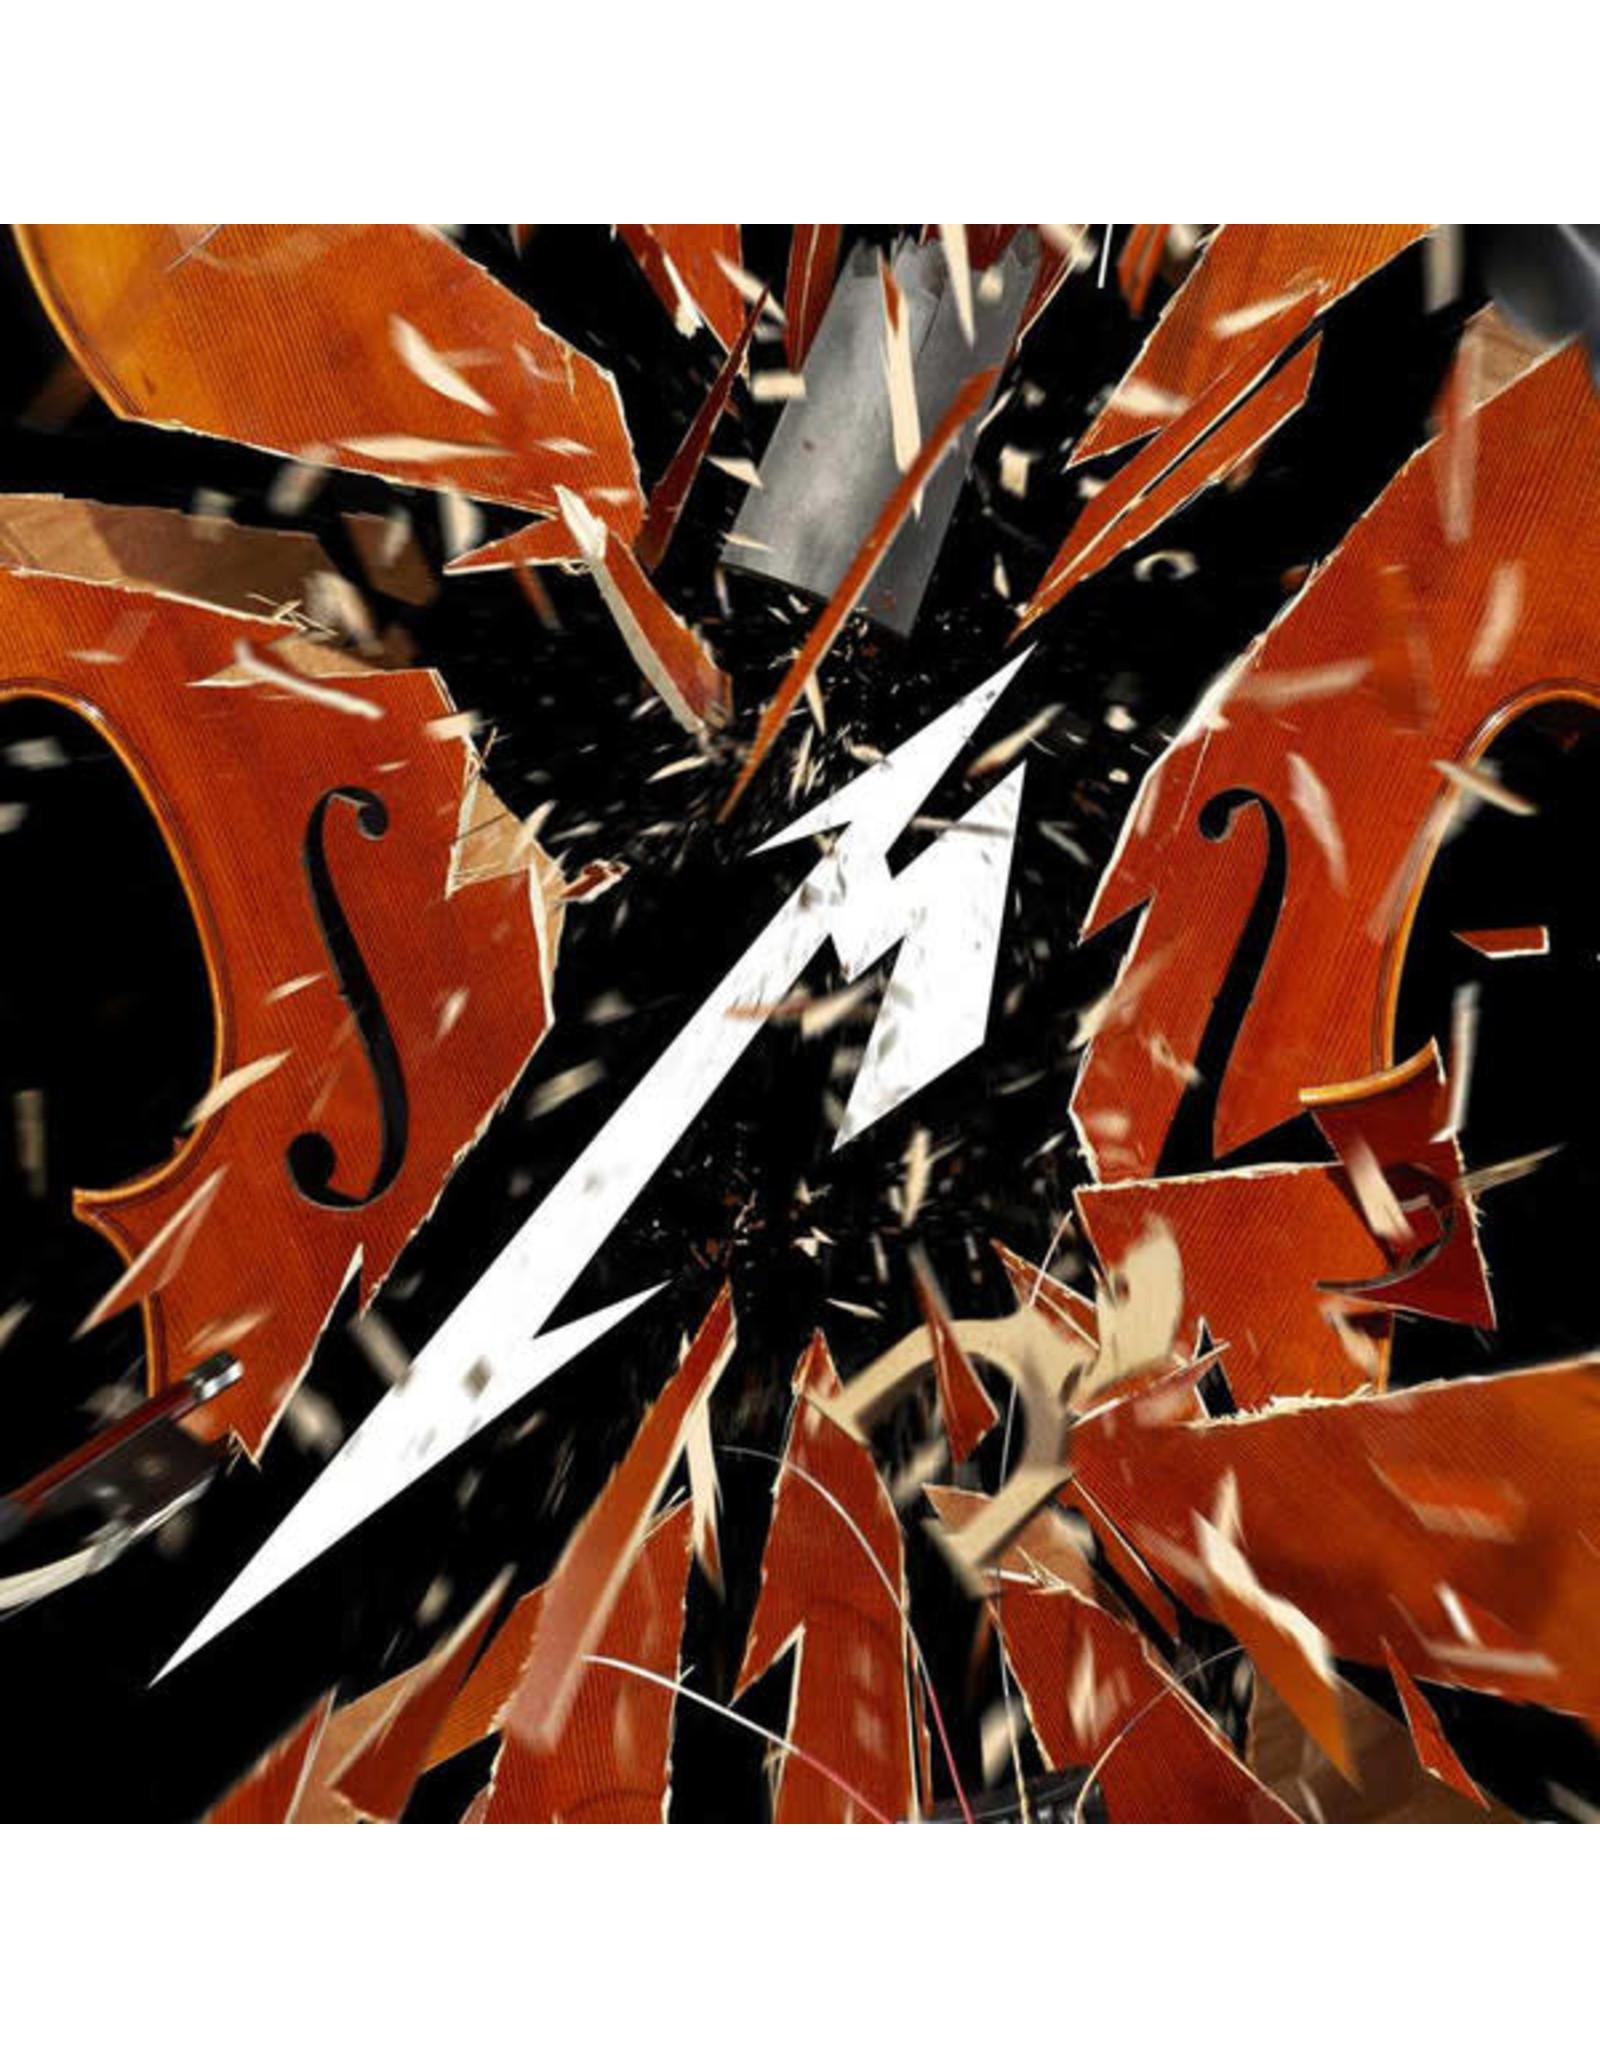 Metallica / S&M2 4lp set